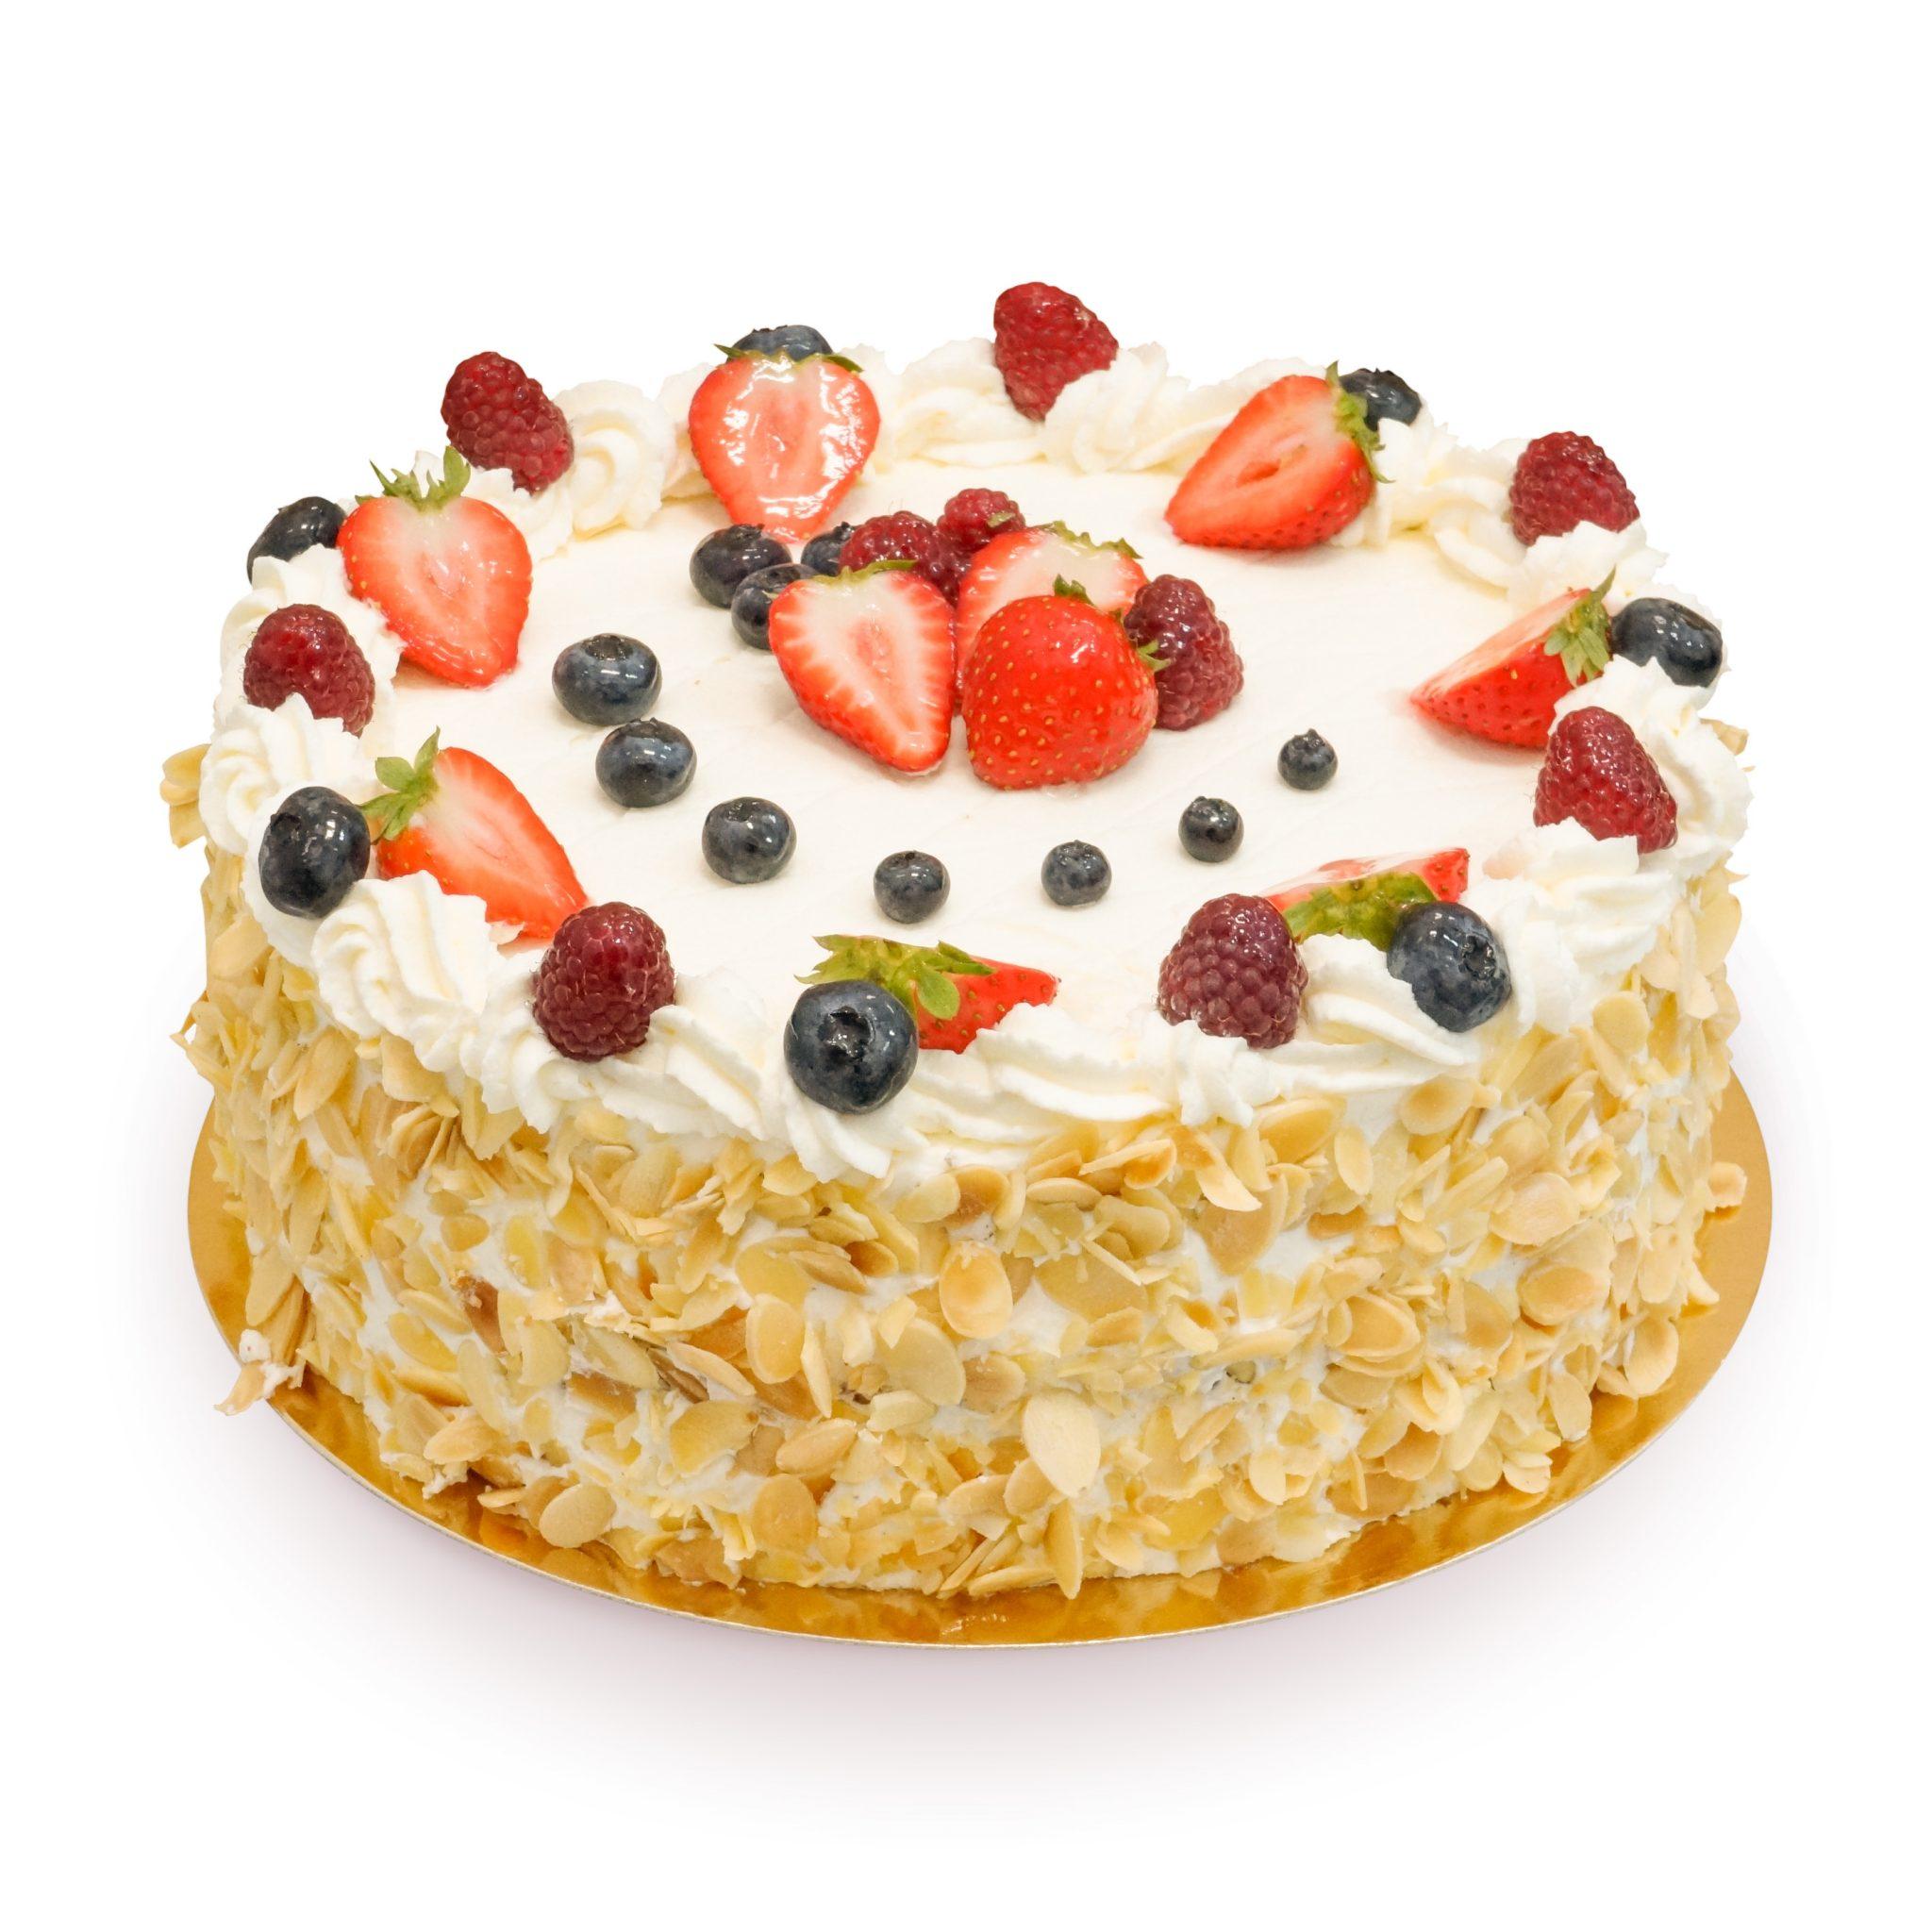 tort z truskawkami, malinami i borówkami ostrów wielkopolski